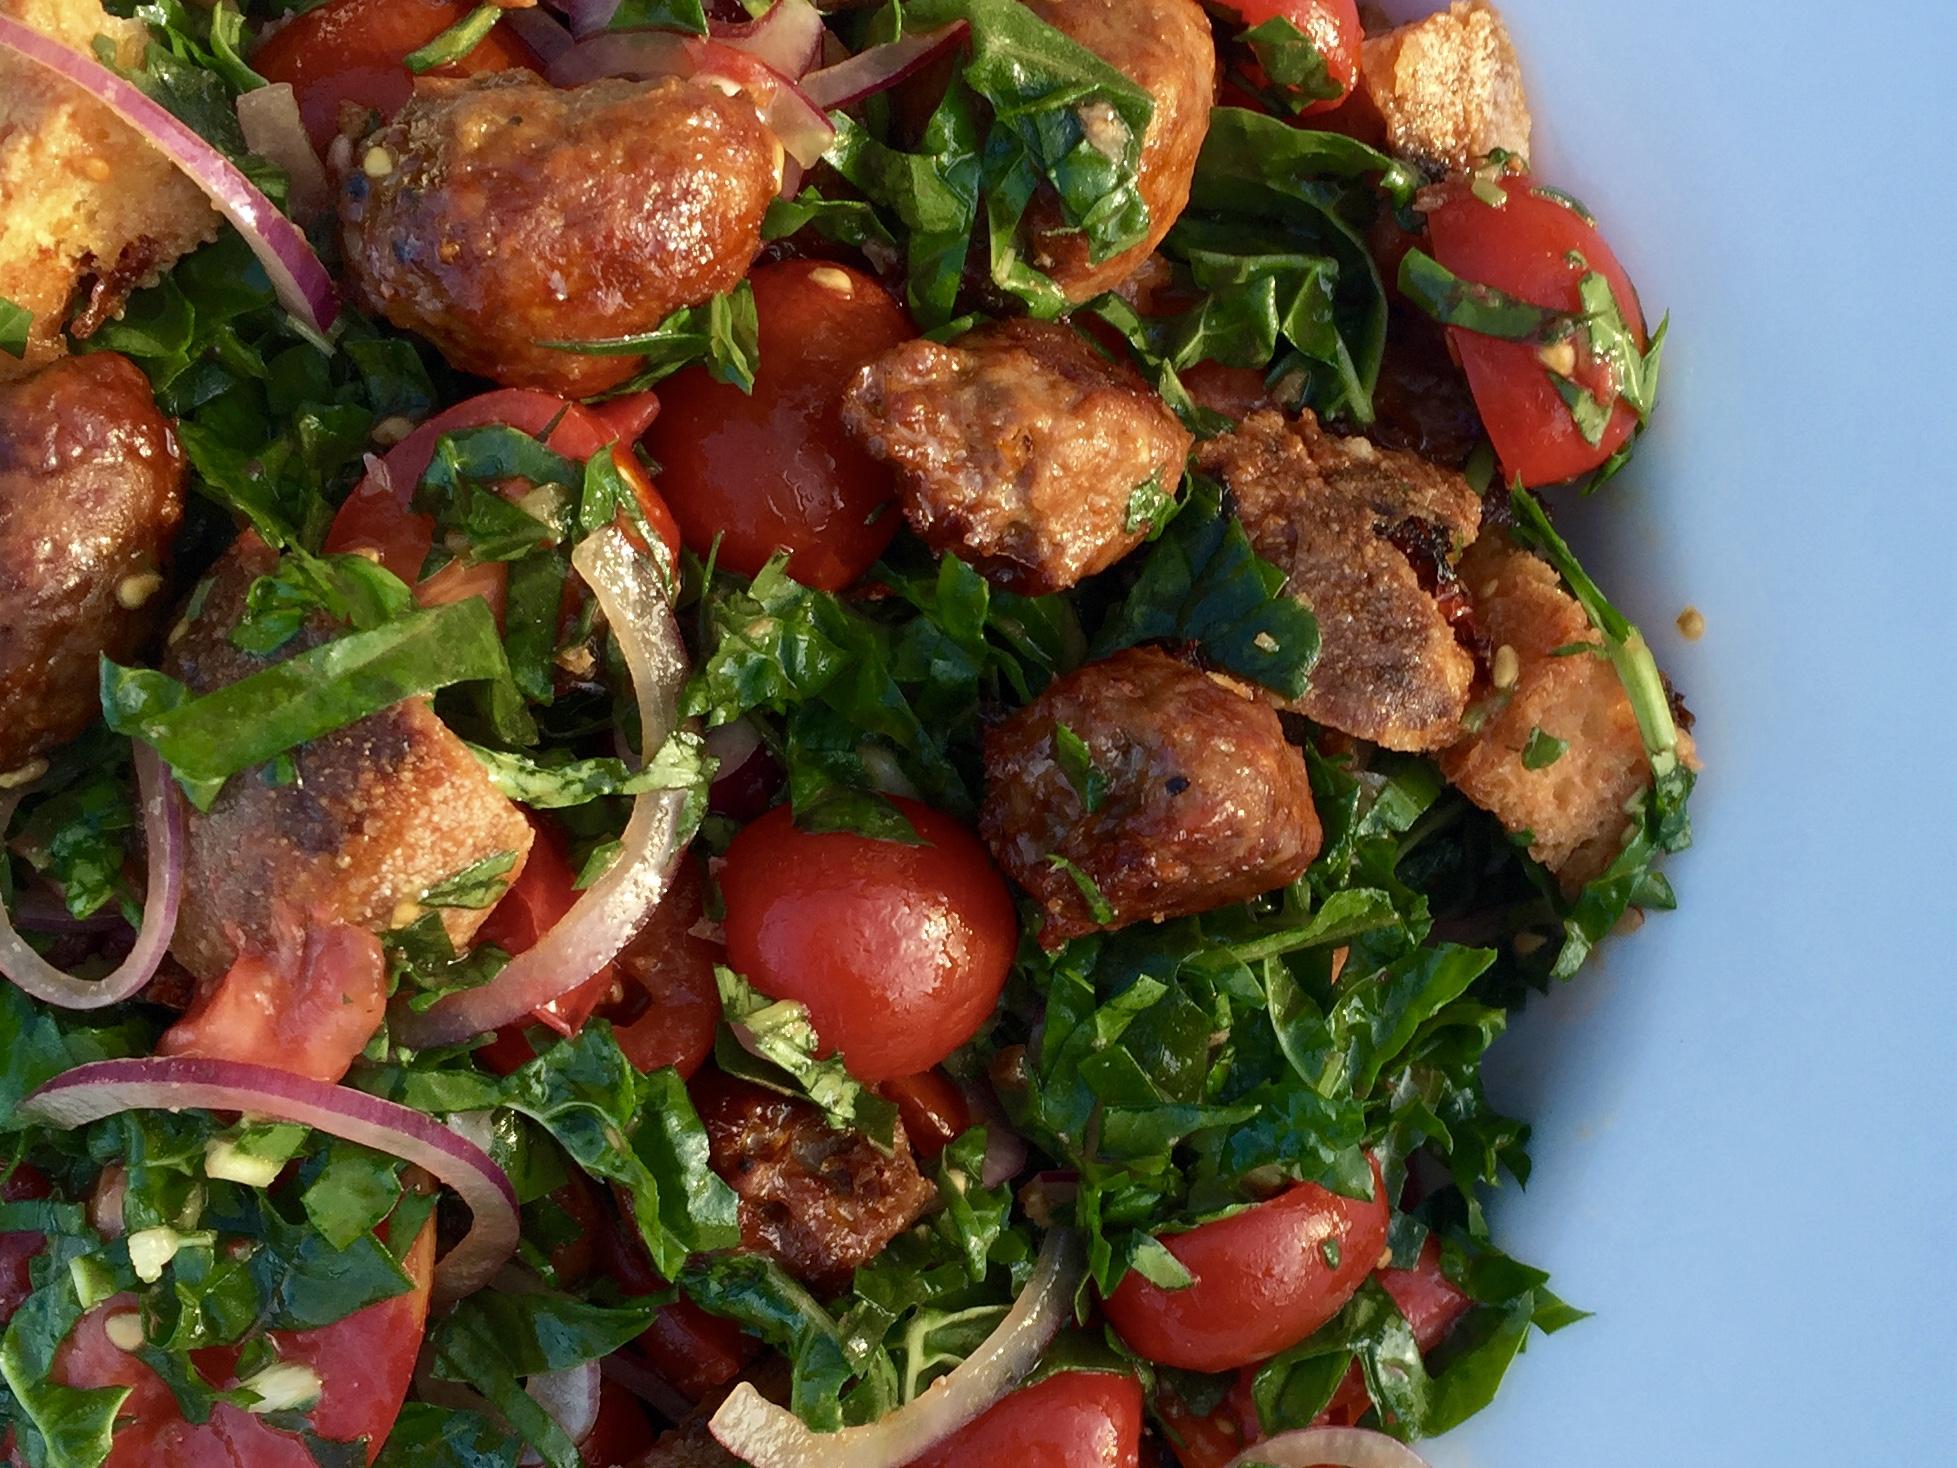 sausage, bread and tomato salad